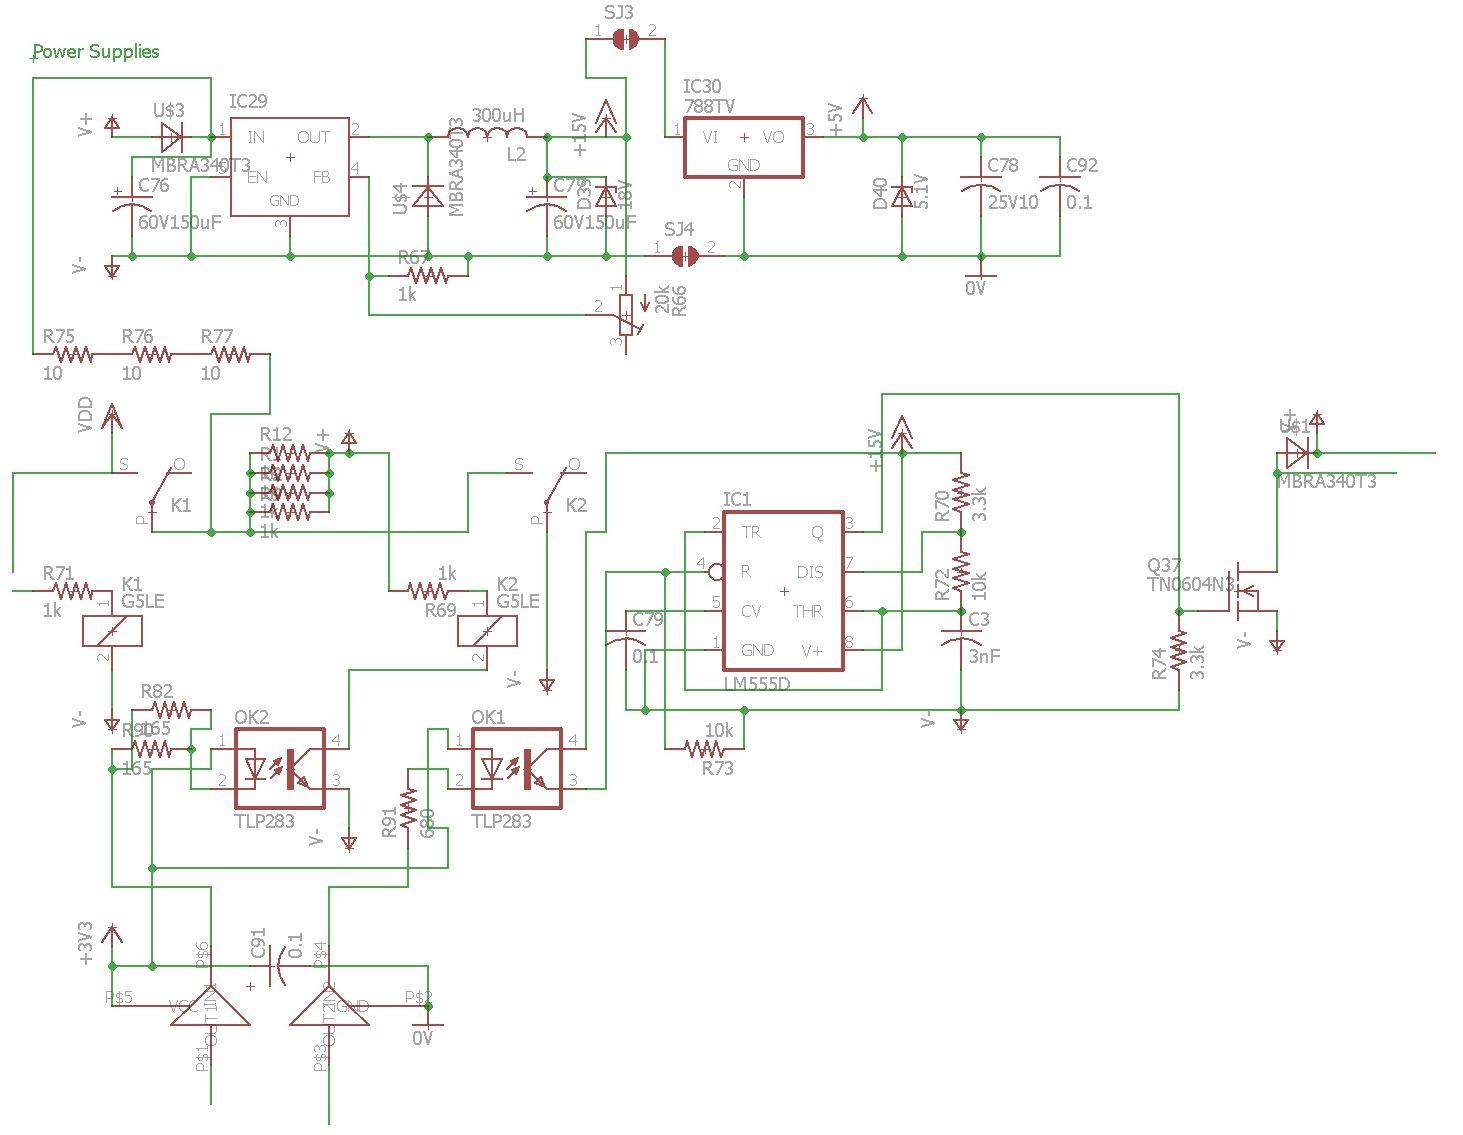 1995 Jeep Wrangler Wiring Diagram | Electrick Wiring Diagram @co - Hoverboard Wiring Diagram